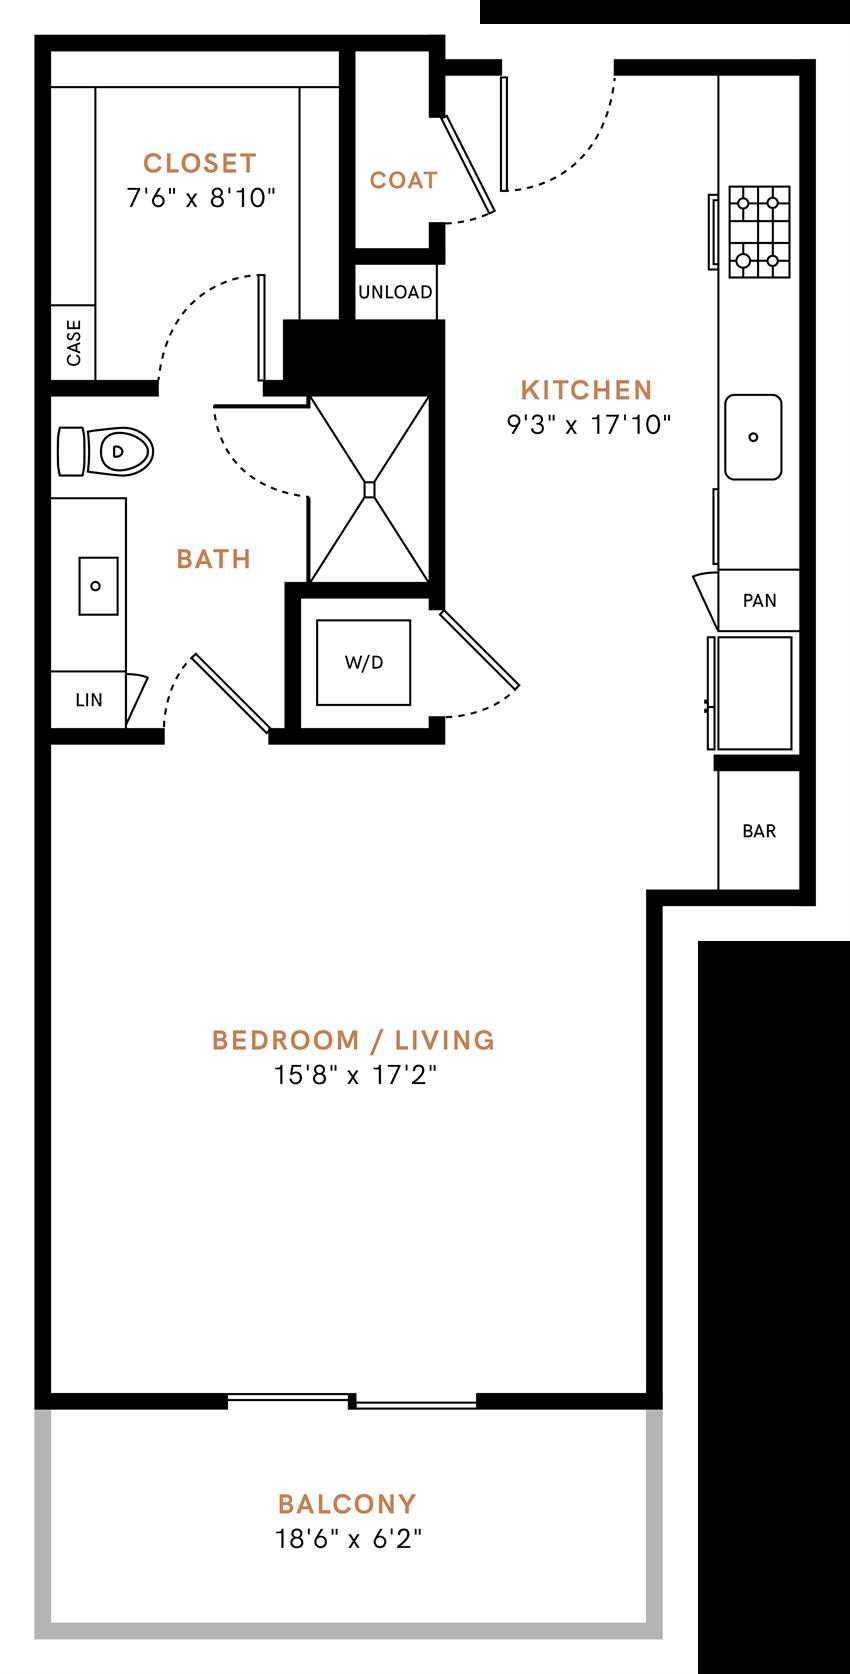 Studio/ one bathroom, kitchen, walk-in closet, coat closet, laundry room, S2 floor plan, 696 square feet.